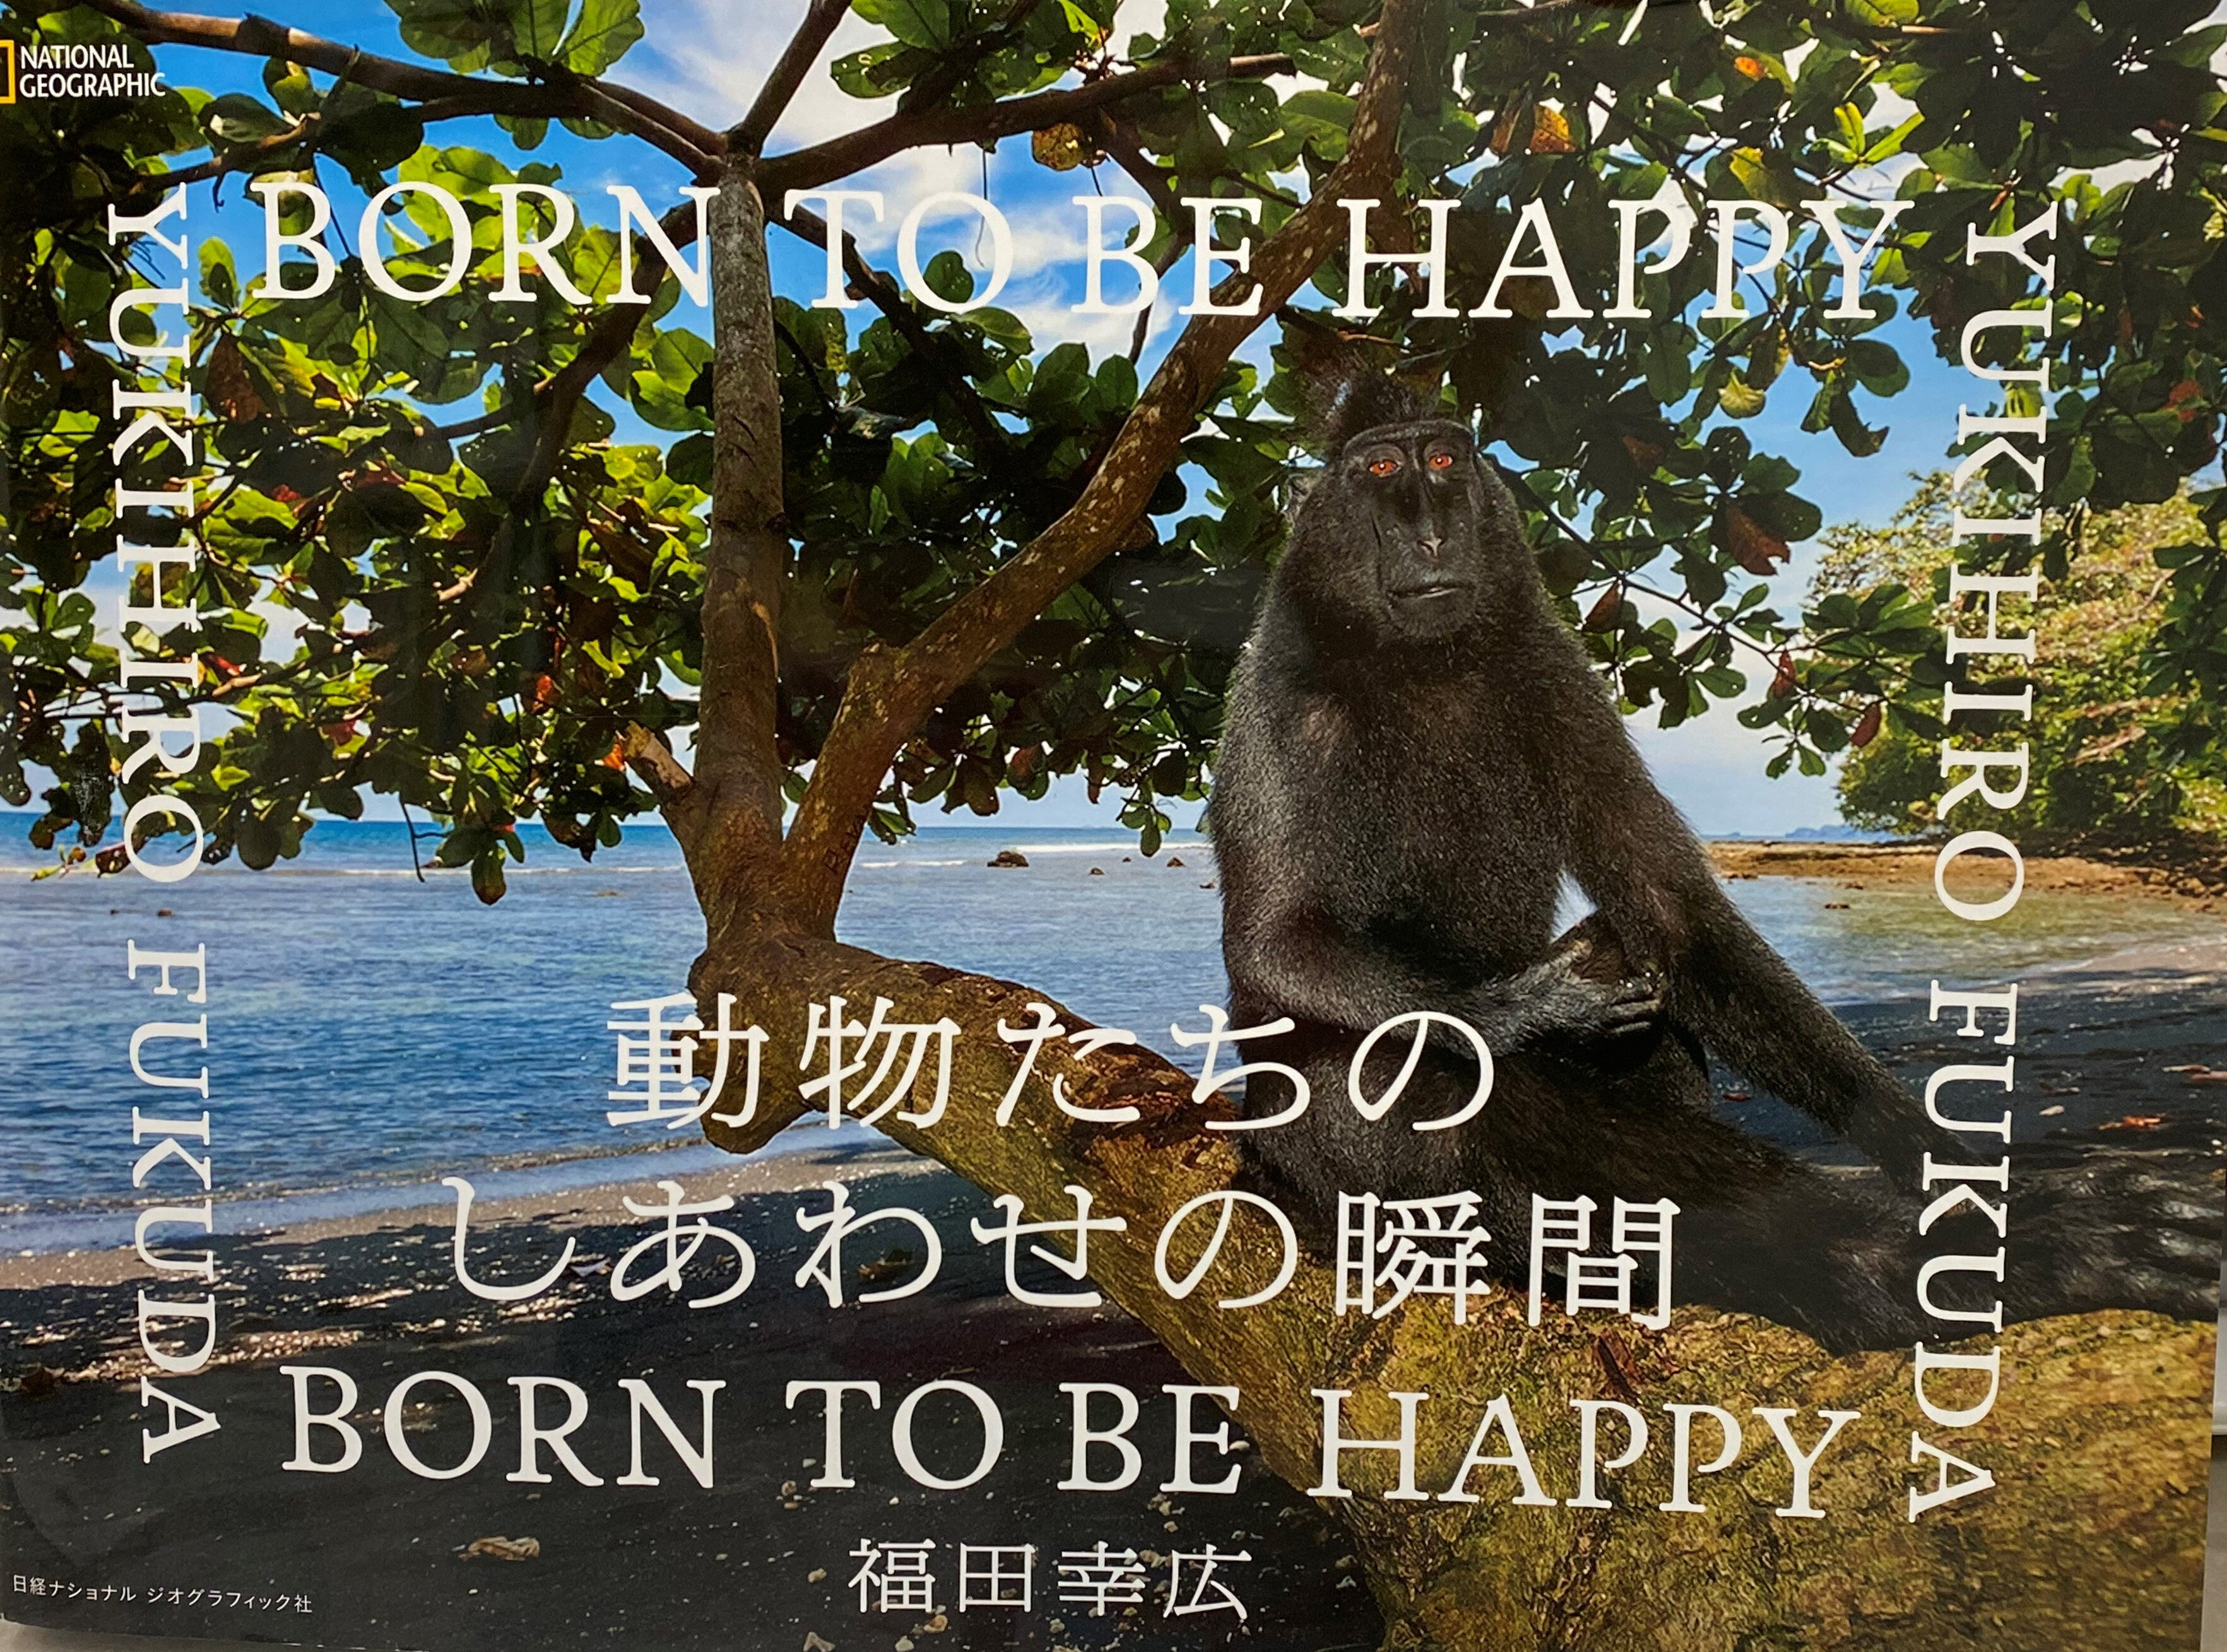 image_17176833 (2).JPG